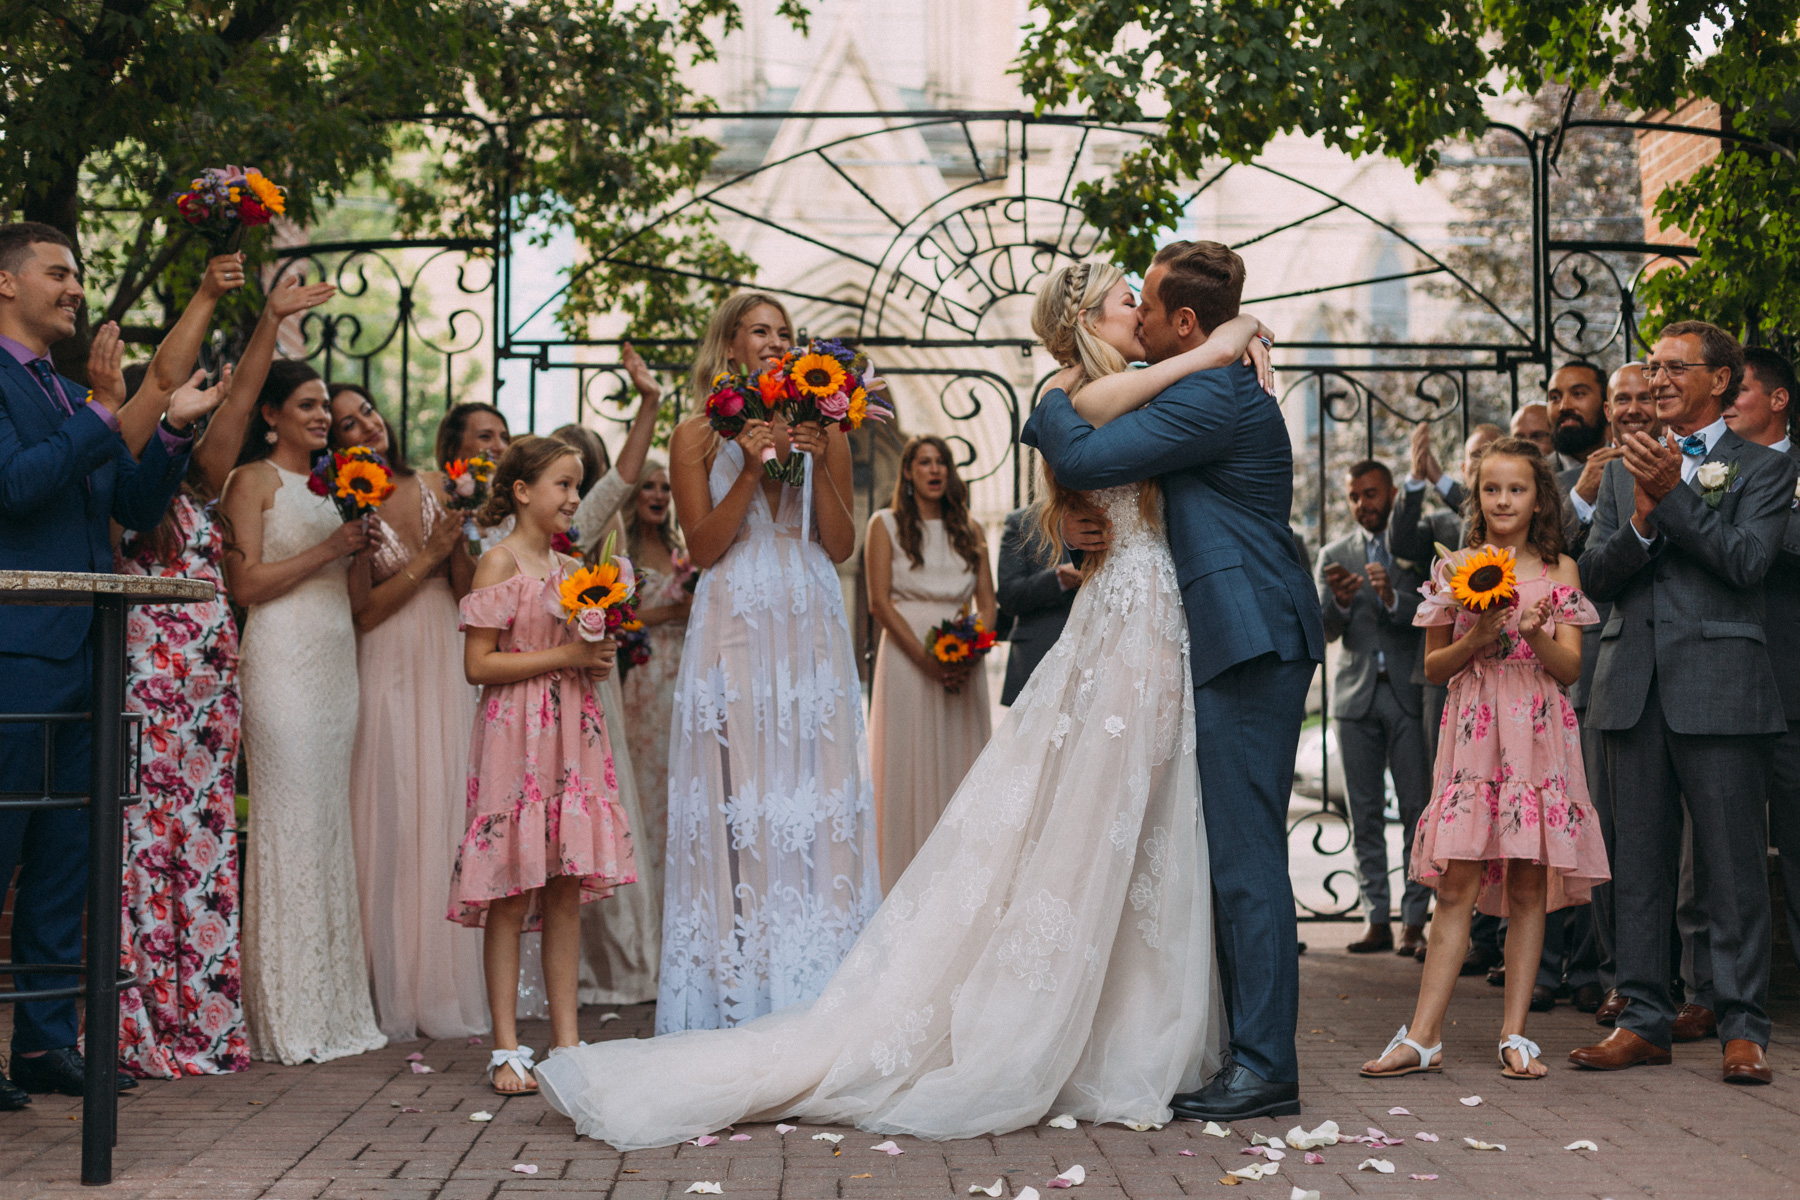 La-Maquette-wedding-by-Toronto-modern-wedding-photographer-Sam-Wong_30.jpg